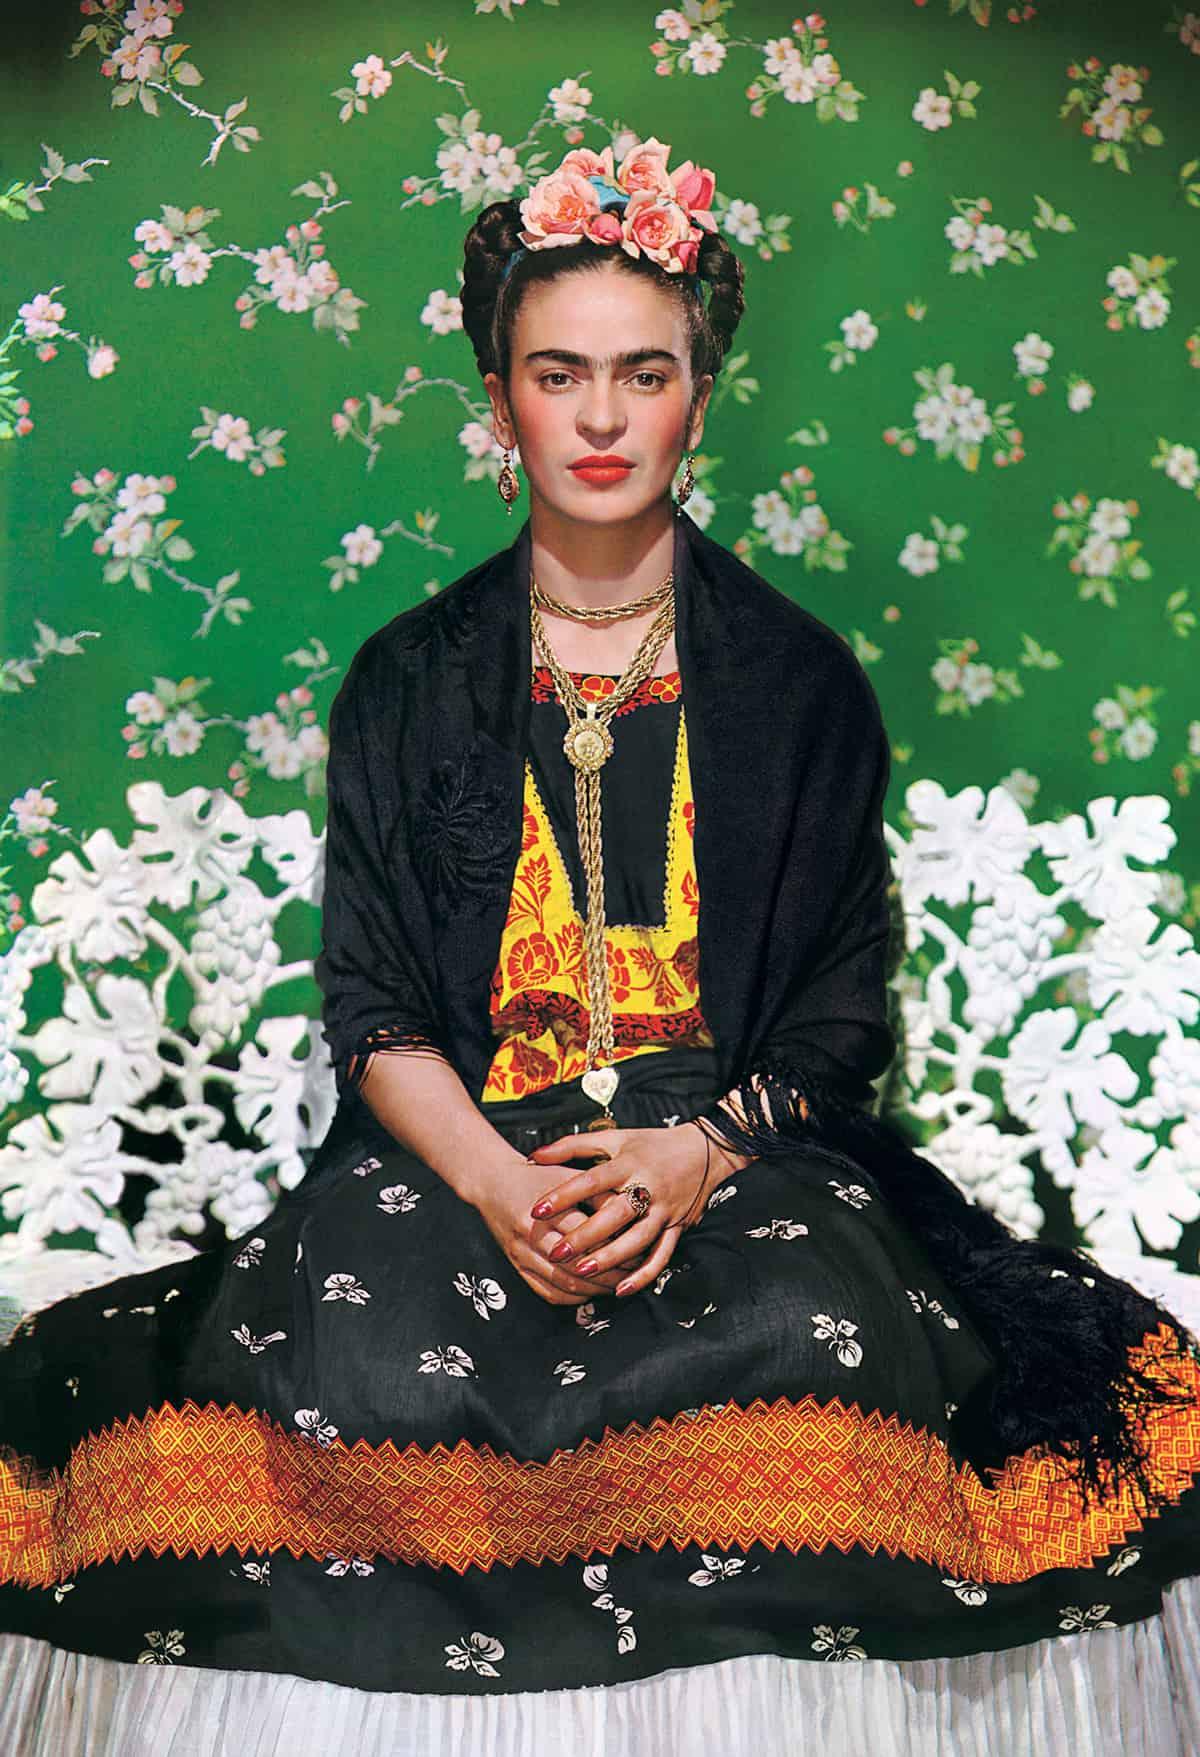 Nickolas Muray Frida Kahlo on white bench 1938 The Jacques and Natasha Gelman Collection of Mexican Art © Nickolas Muray Photo Archives